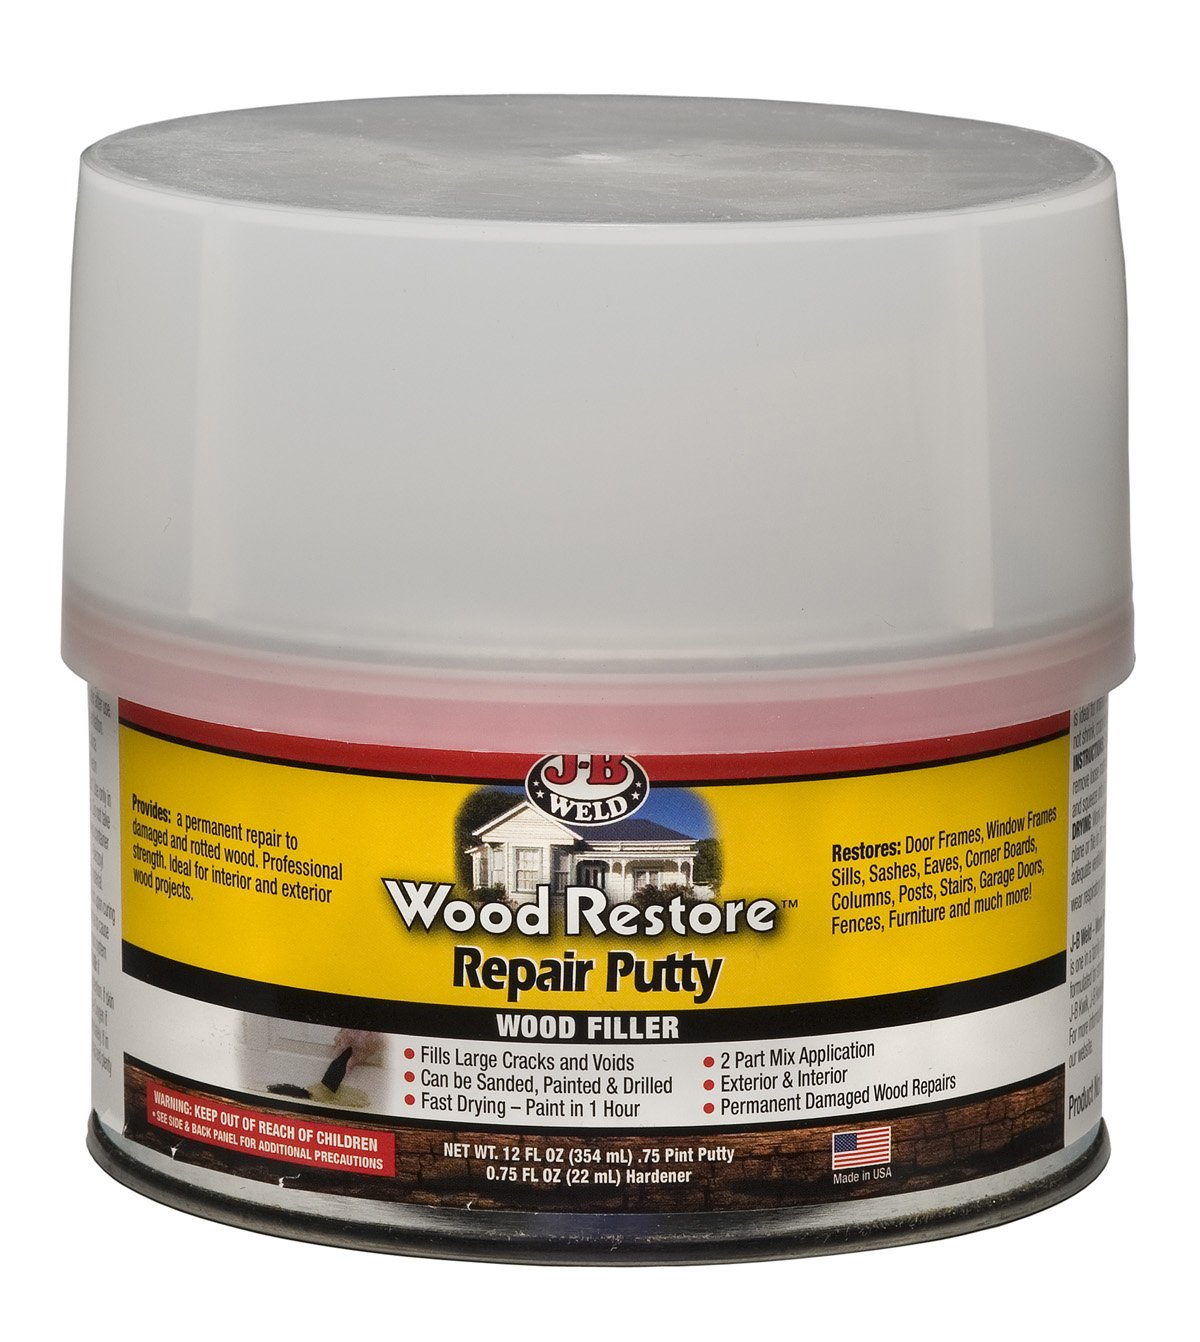 J-B Weld 40003 Wood Restore Repair Putty - 12 oz.